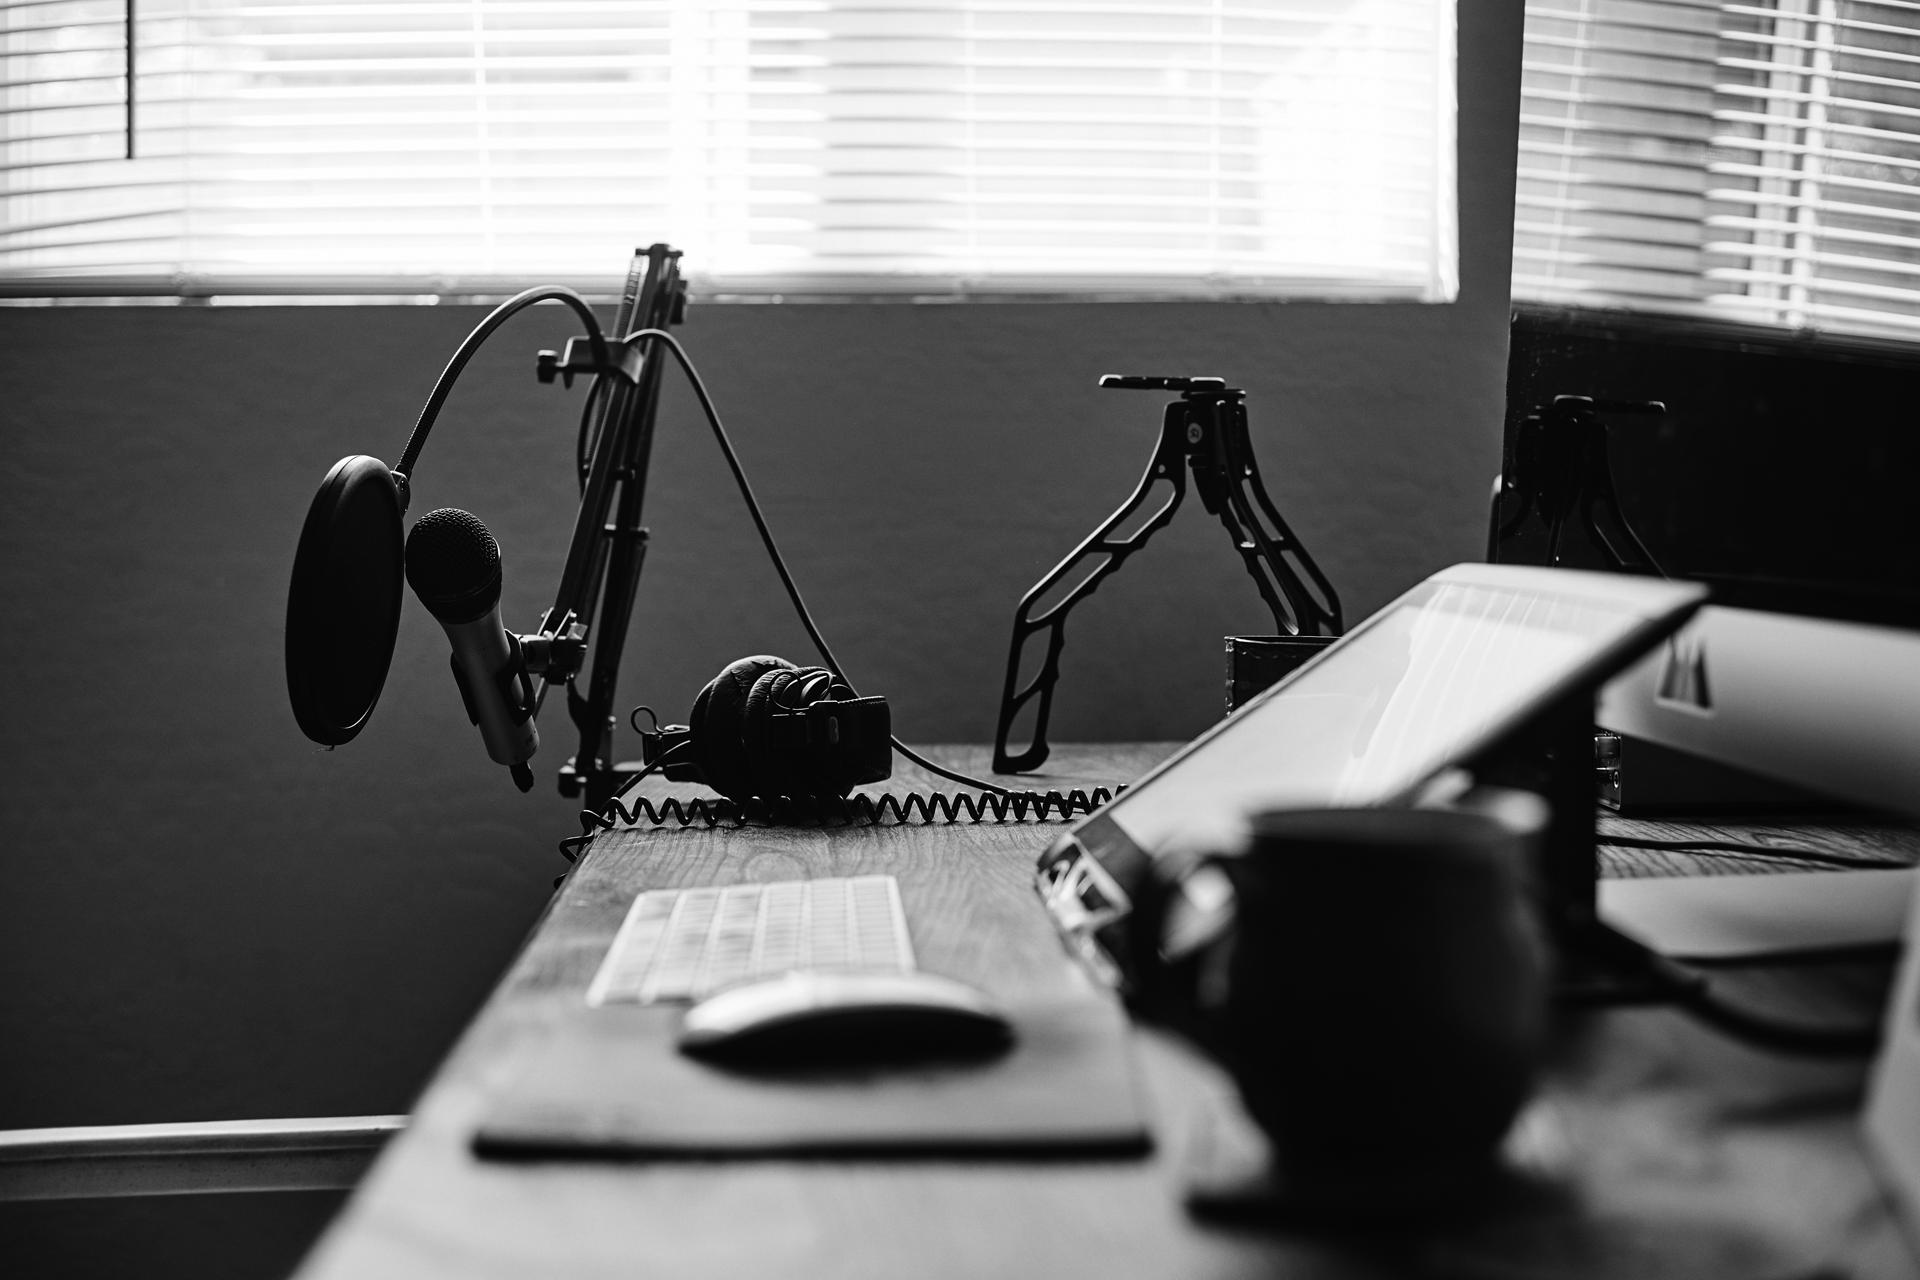 Podever - Podcast Produktion, Podcast Beratung, Podcast Werbung